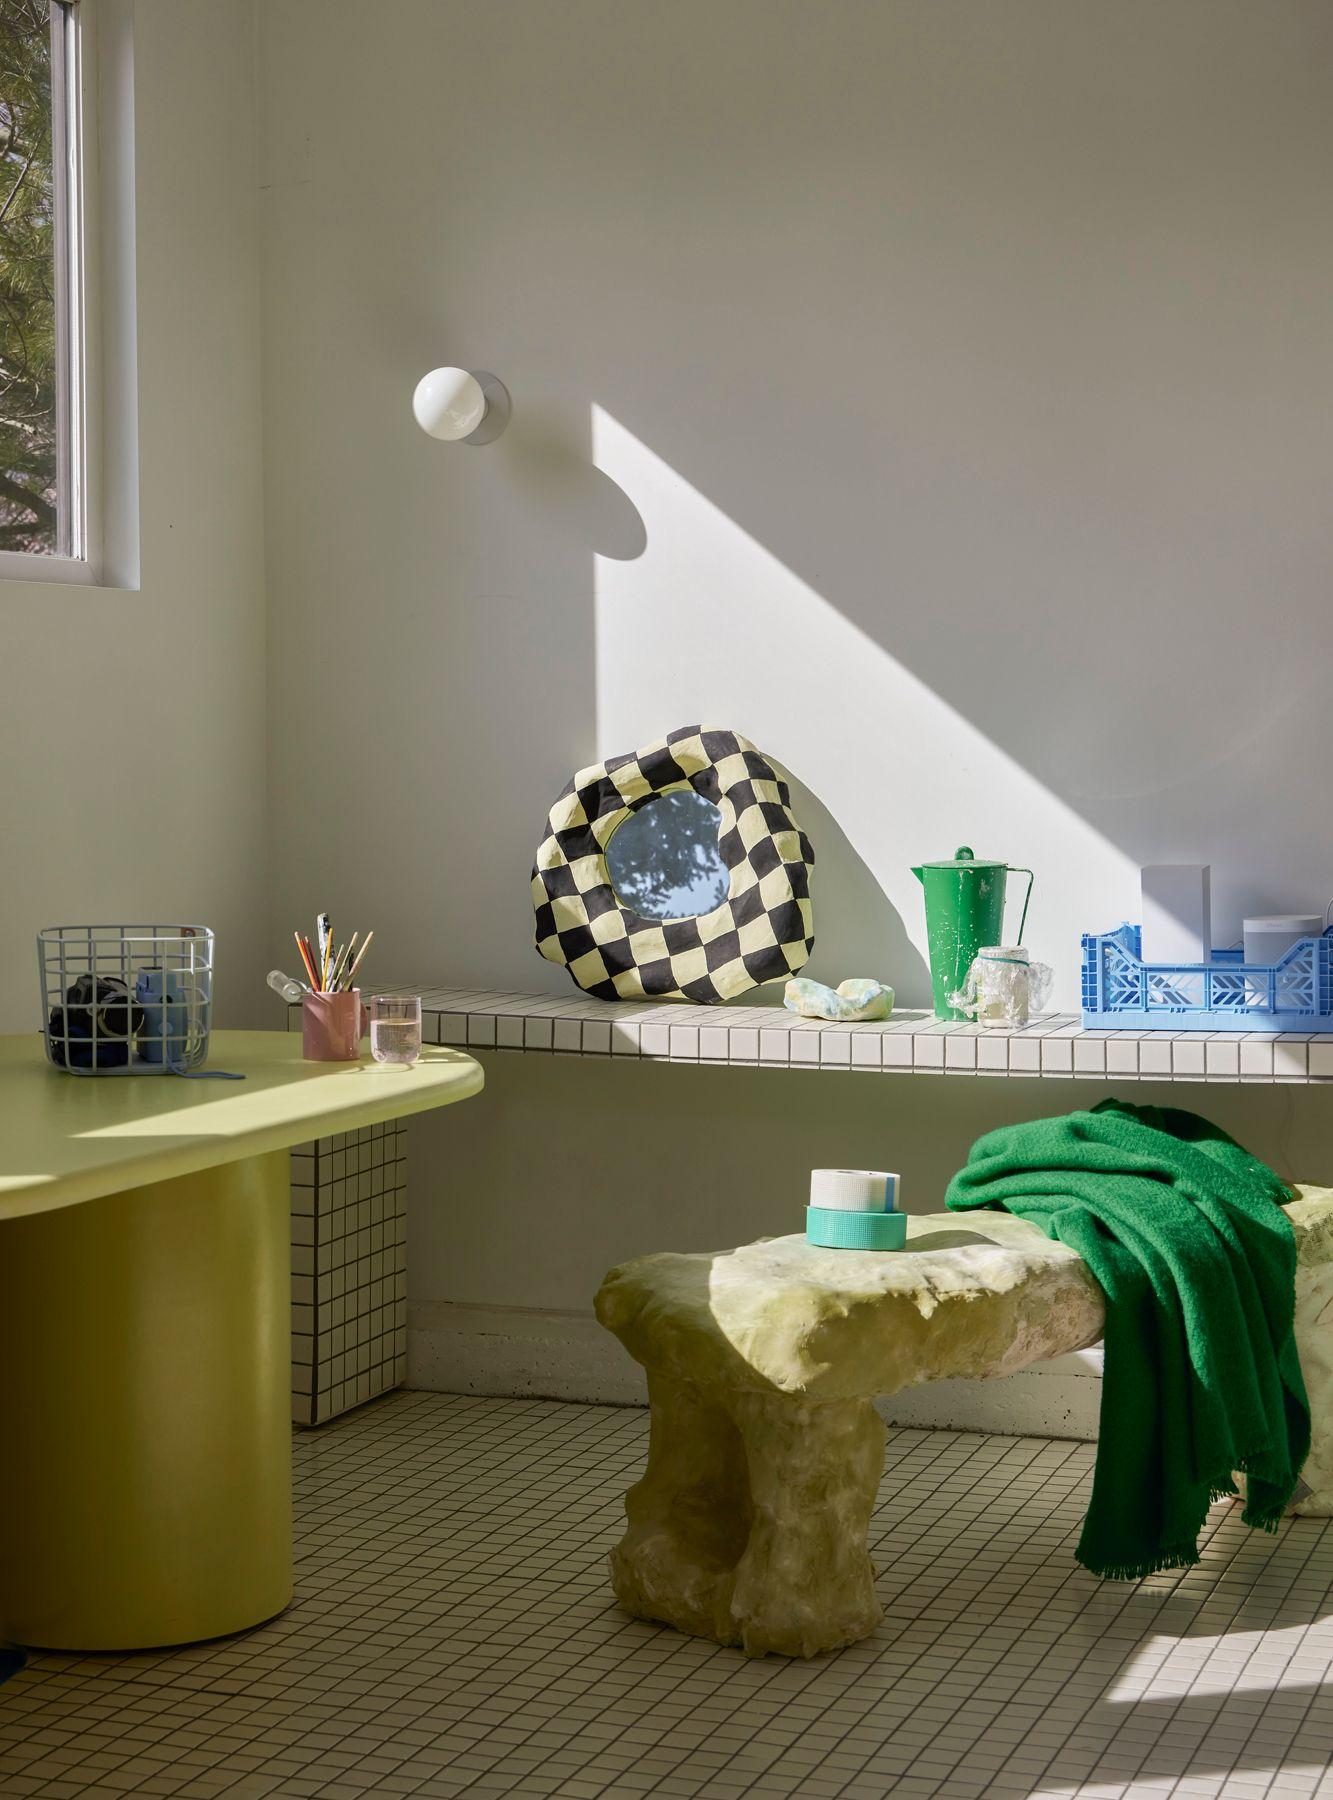 George Barberis Photo Of Bathroom For Domino